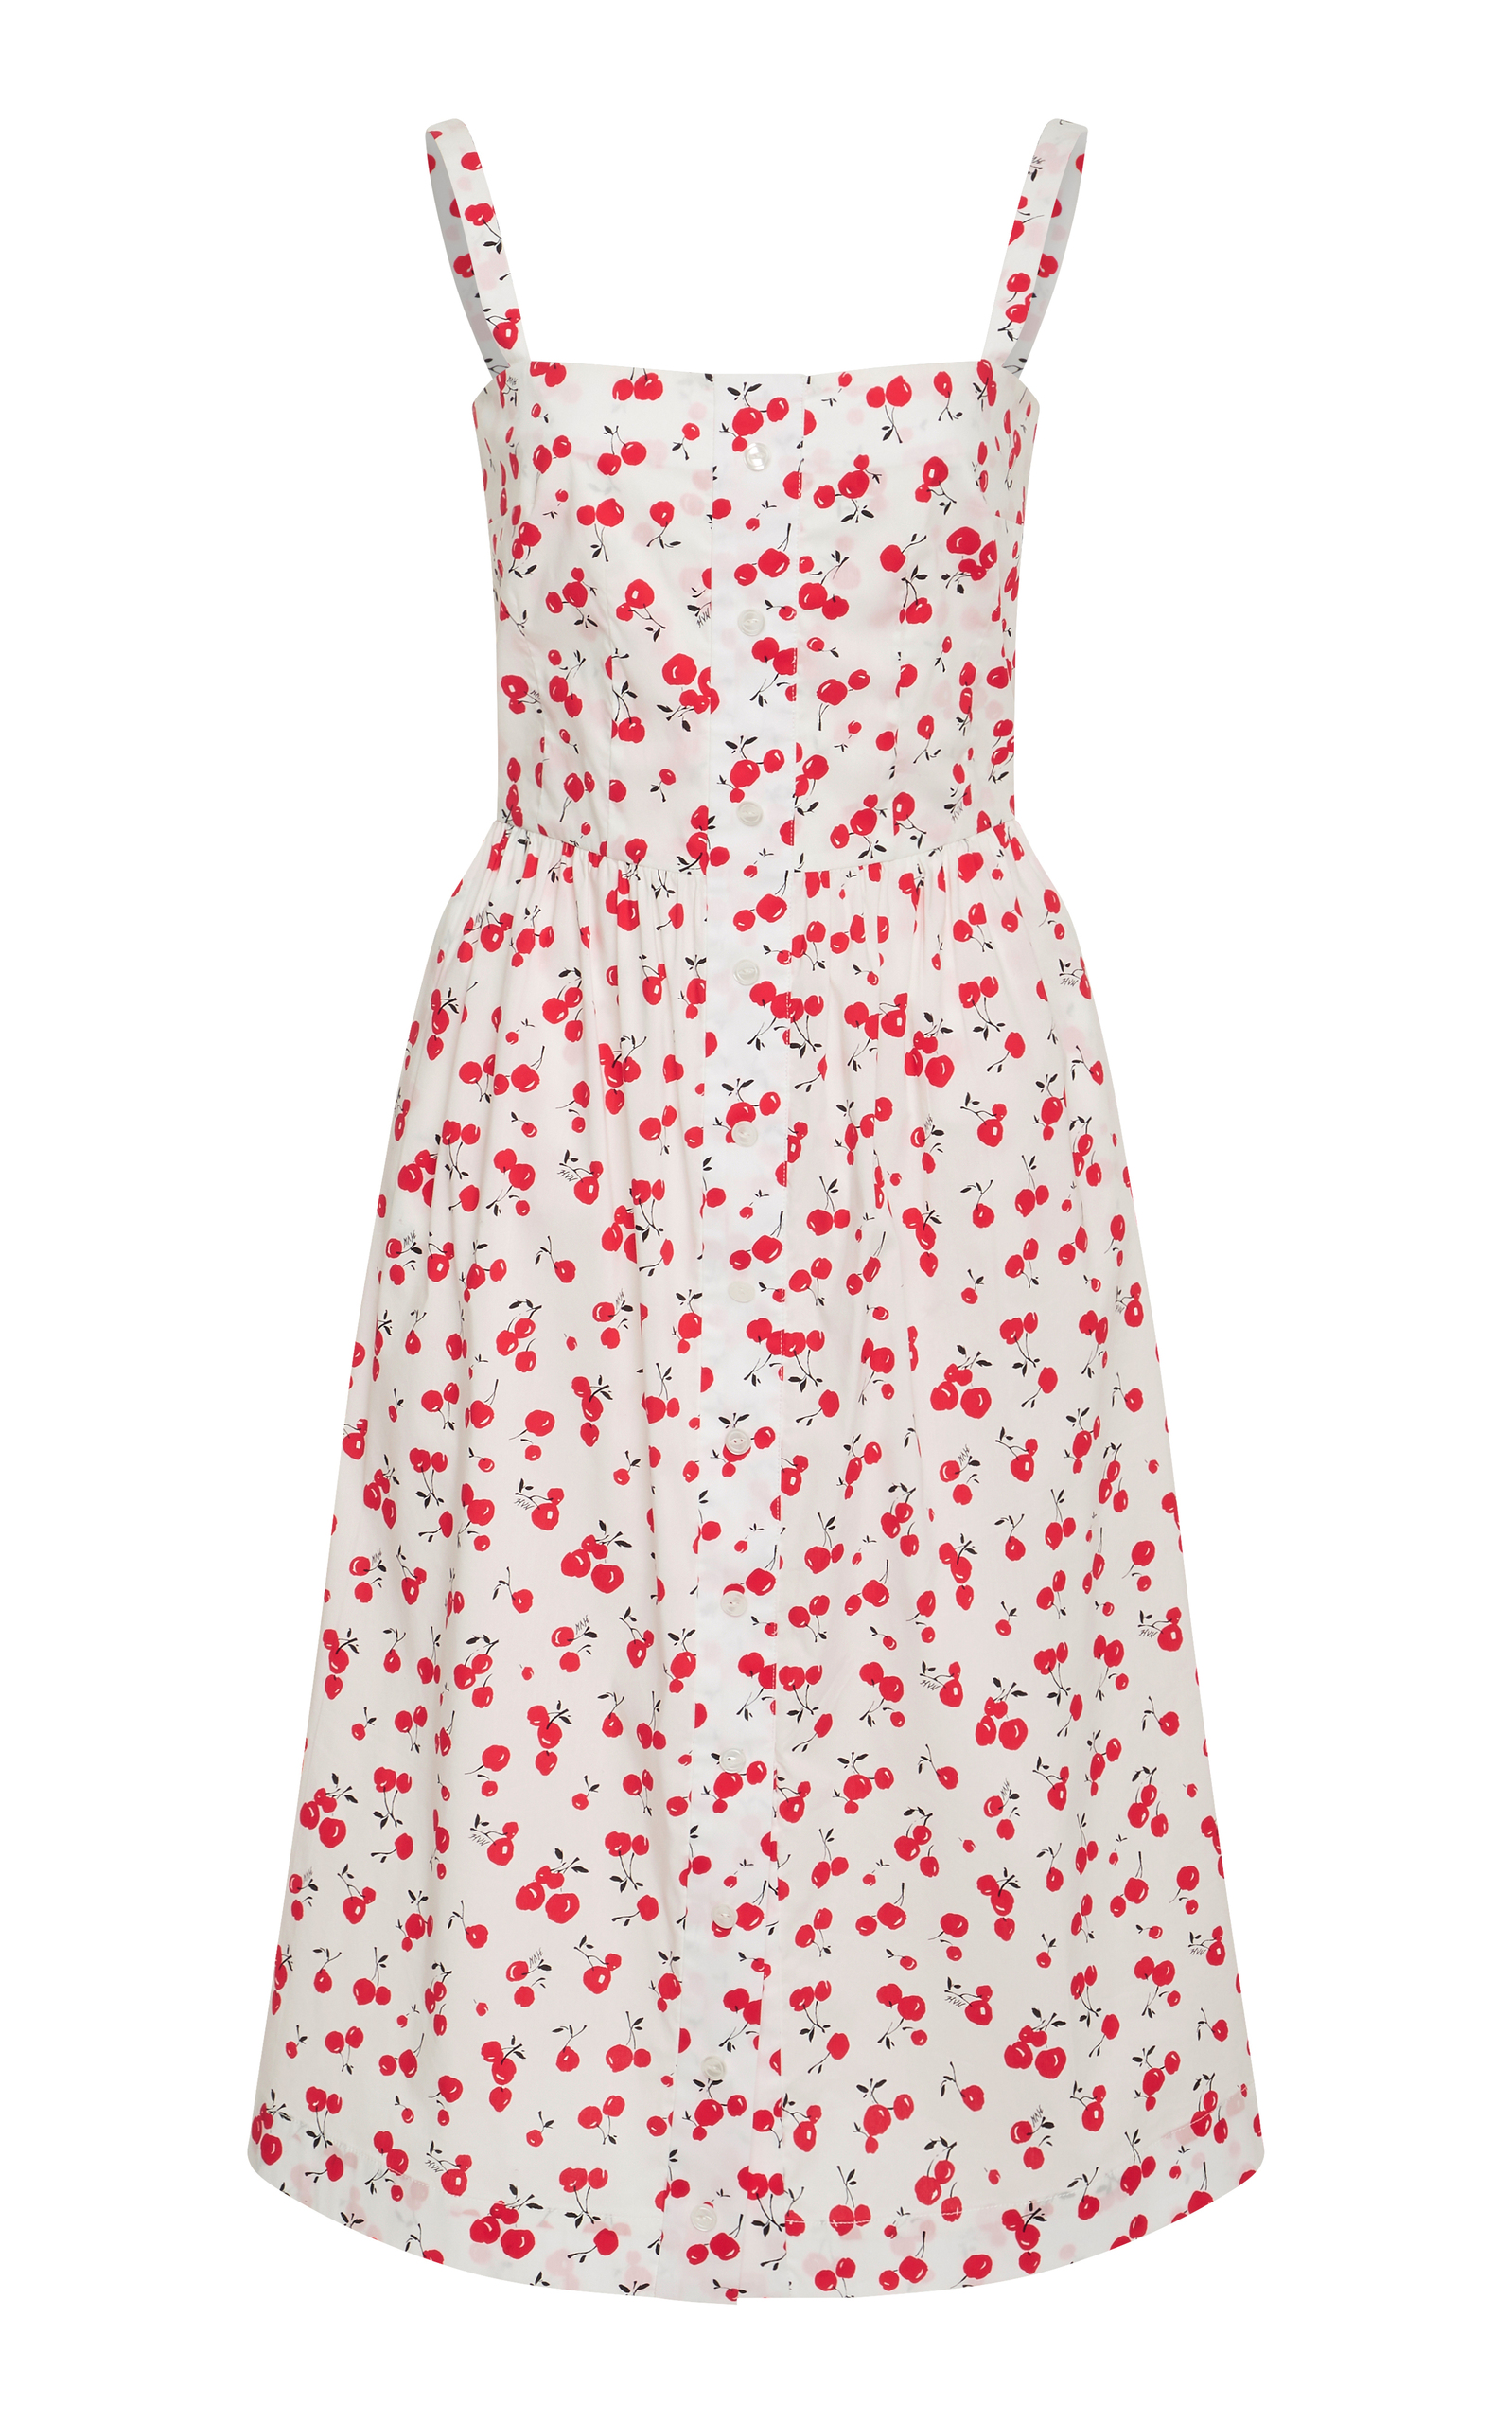 Hvn  LAURA CHERRY PRINTED COTTON DRESS